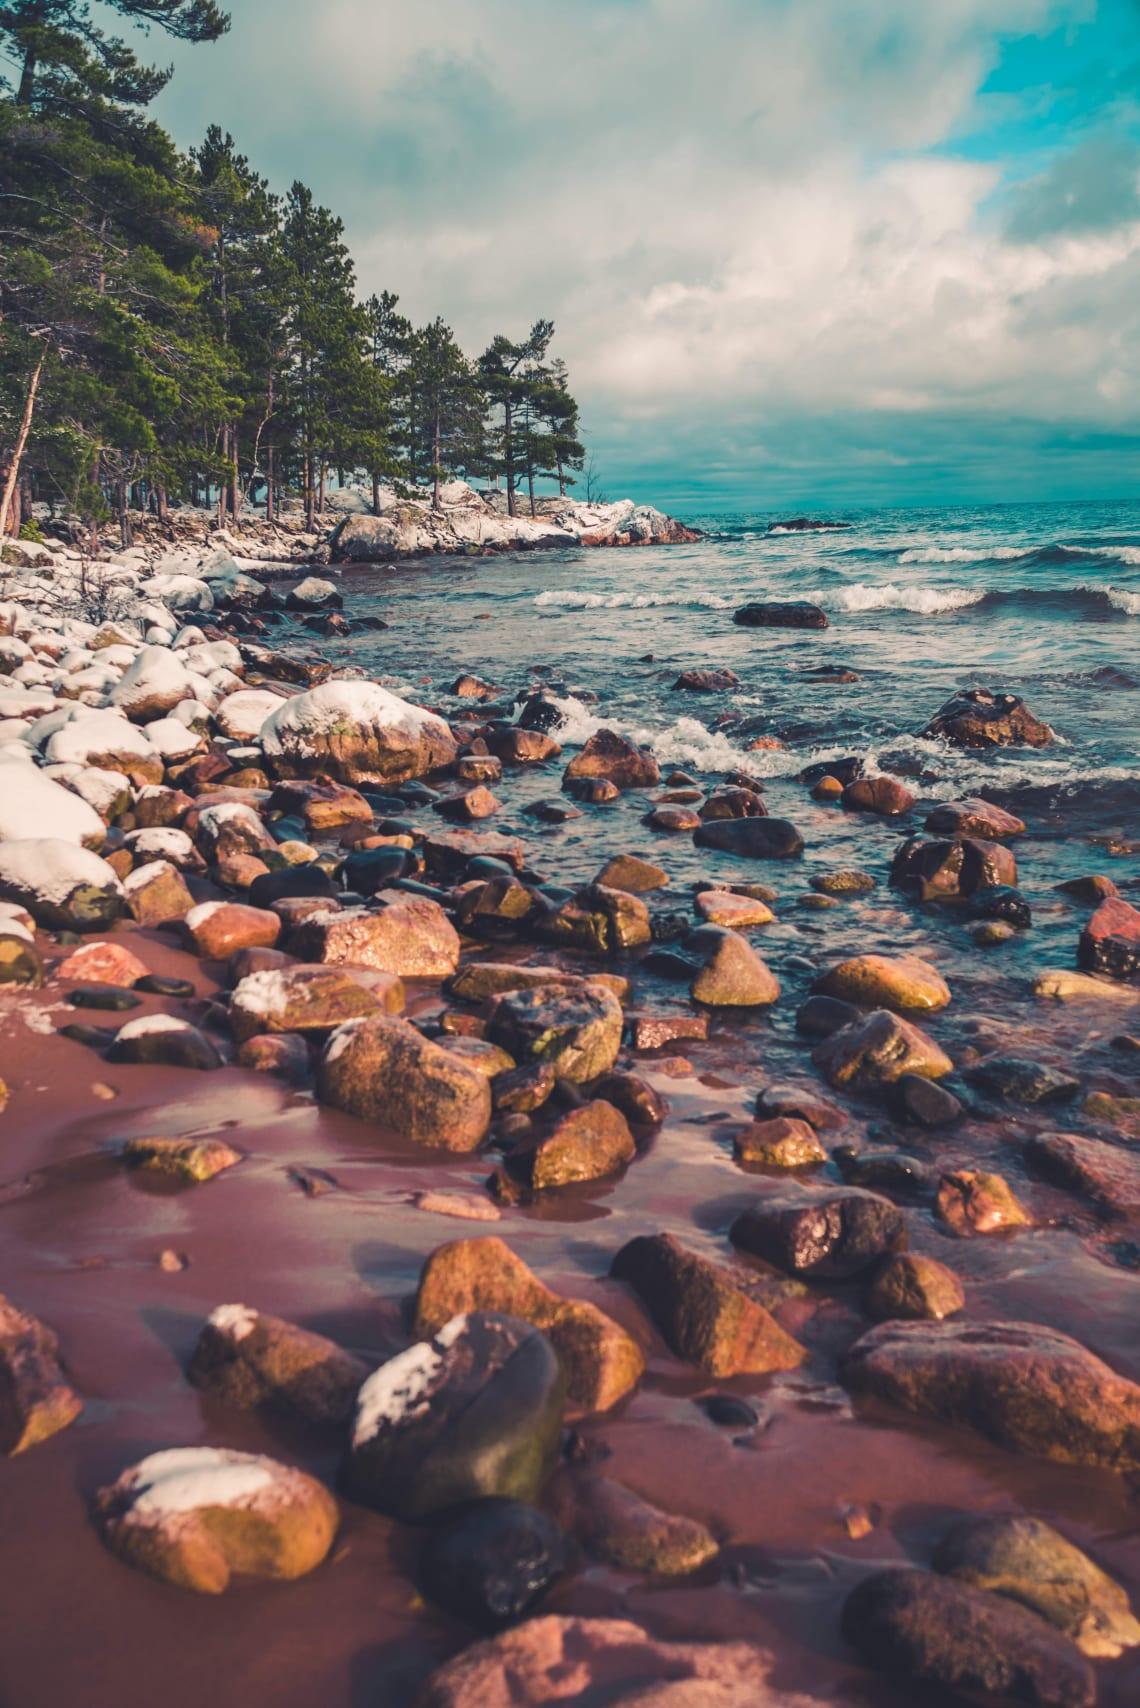 USA travel guide: Michigan